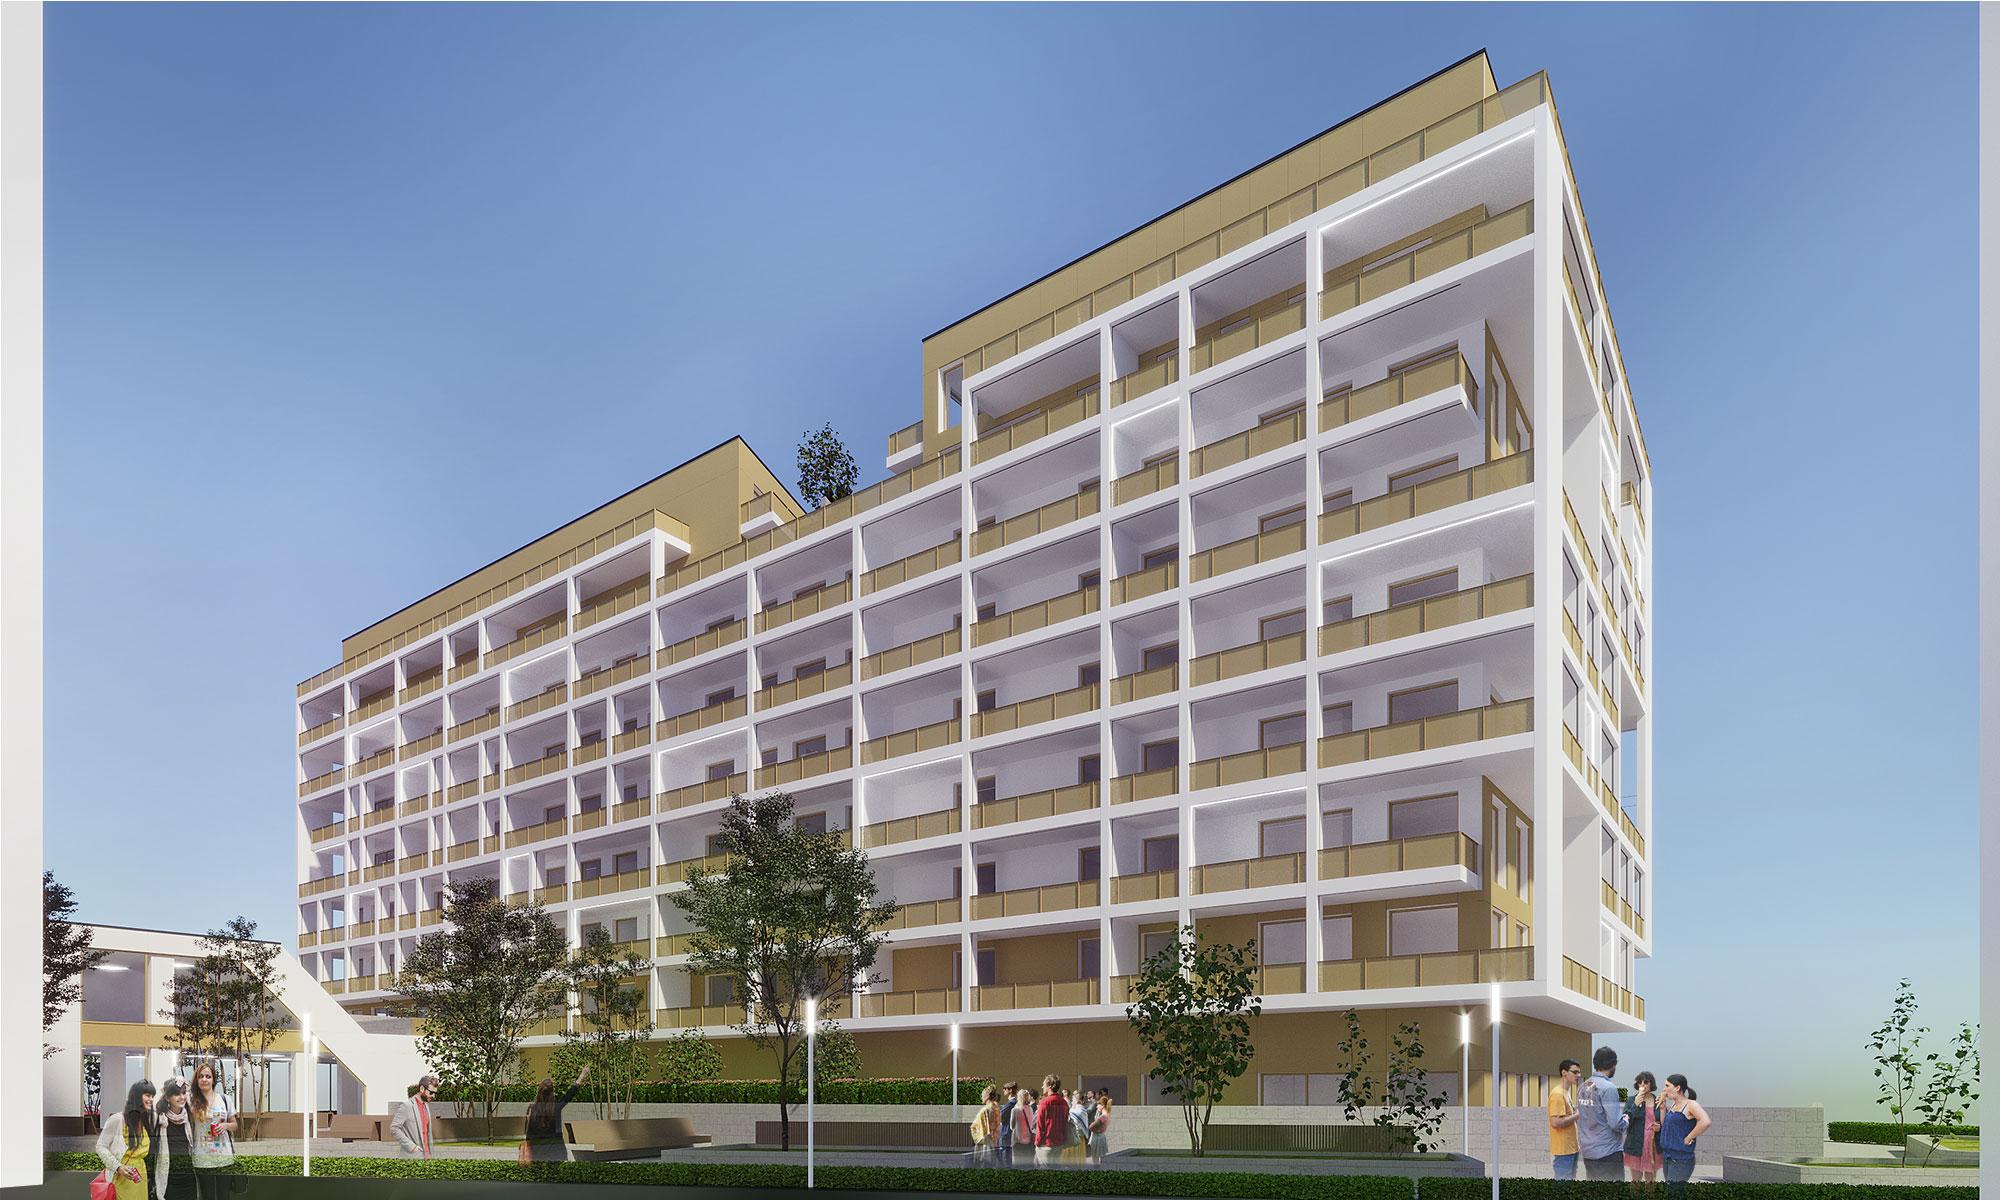 https://nbc-arhitect.ro/wp-content/uploads/2020/10/NBC-Arhitect-_-Glucoza-Residence-_-Bucharest-Romania-_-exterior-view_1-1.jpg